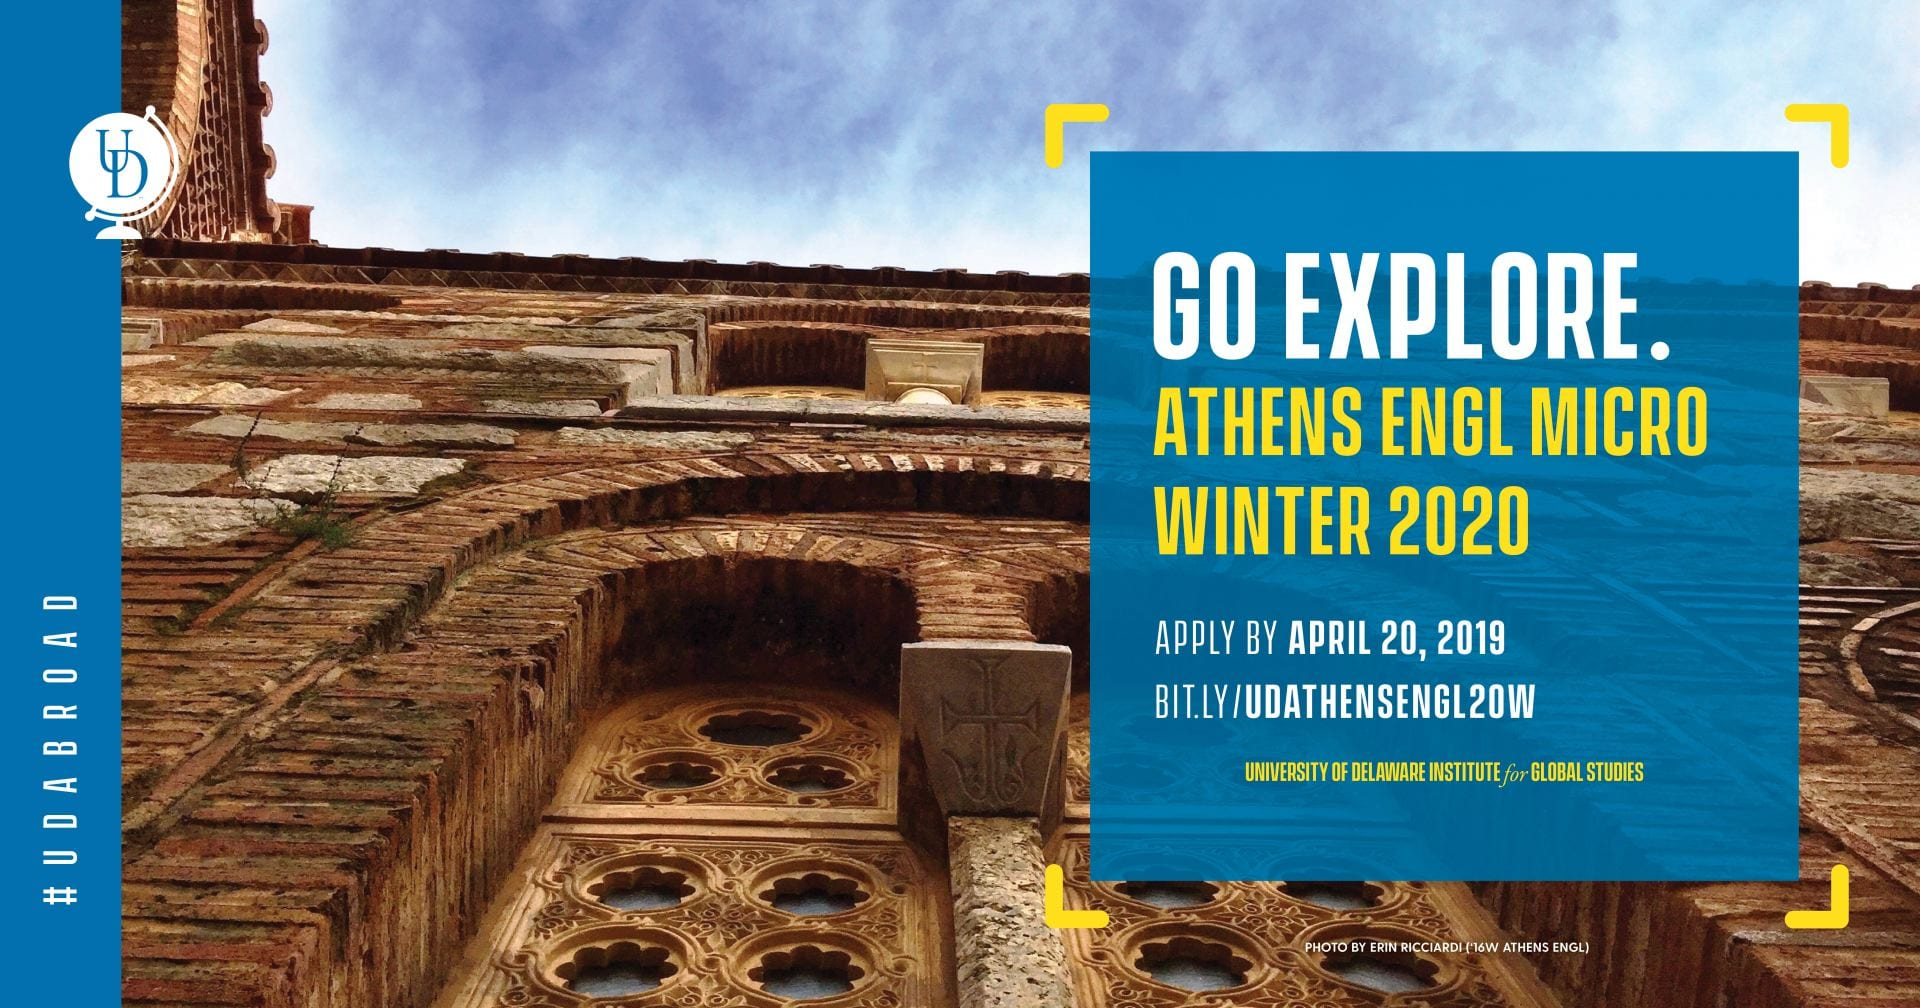 Athens ENGL Micro Winter 2020